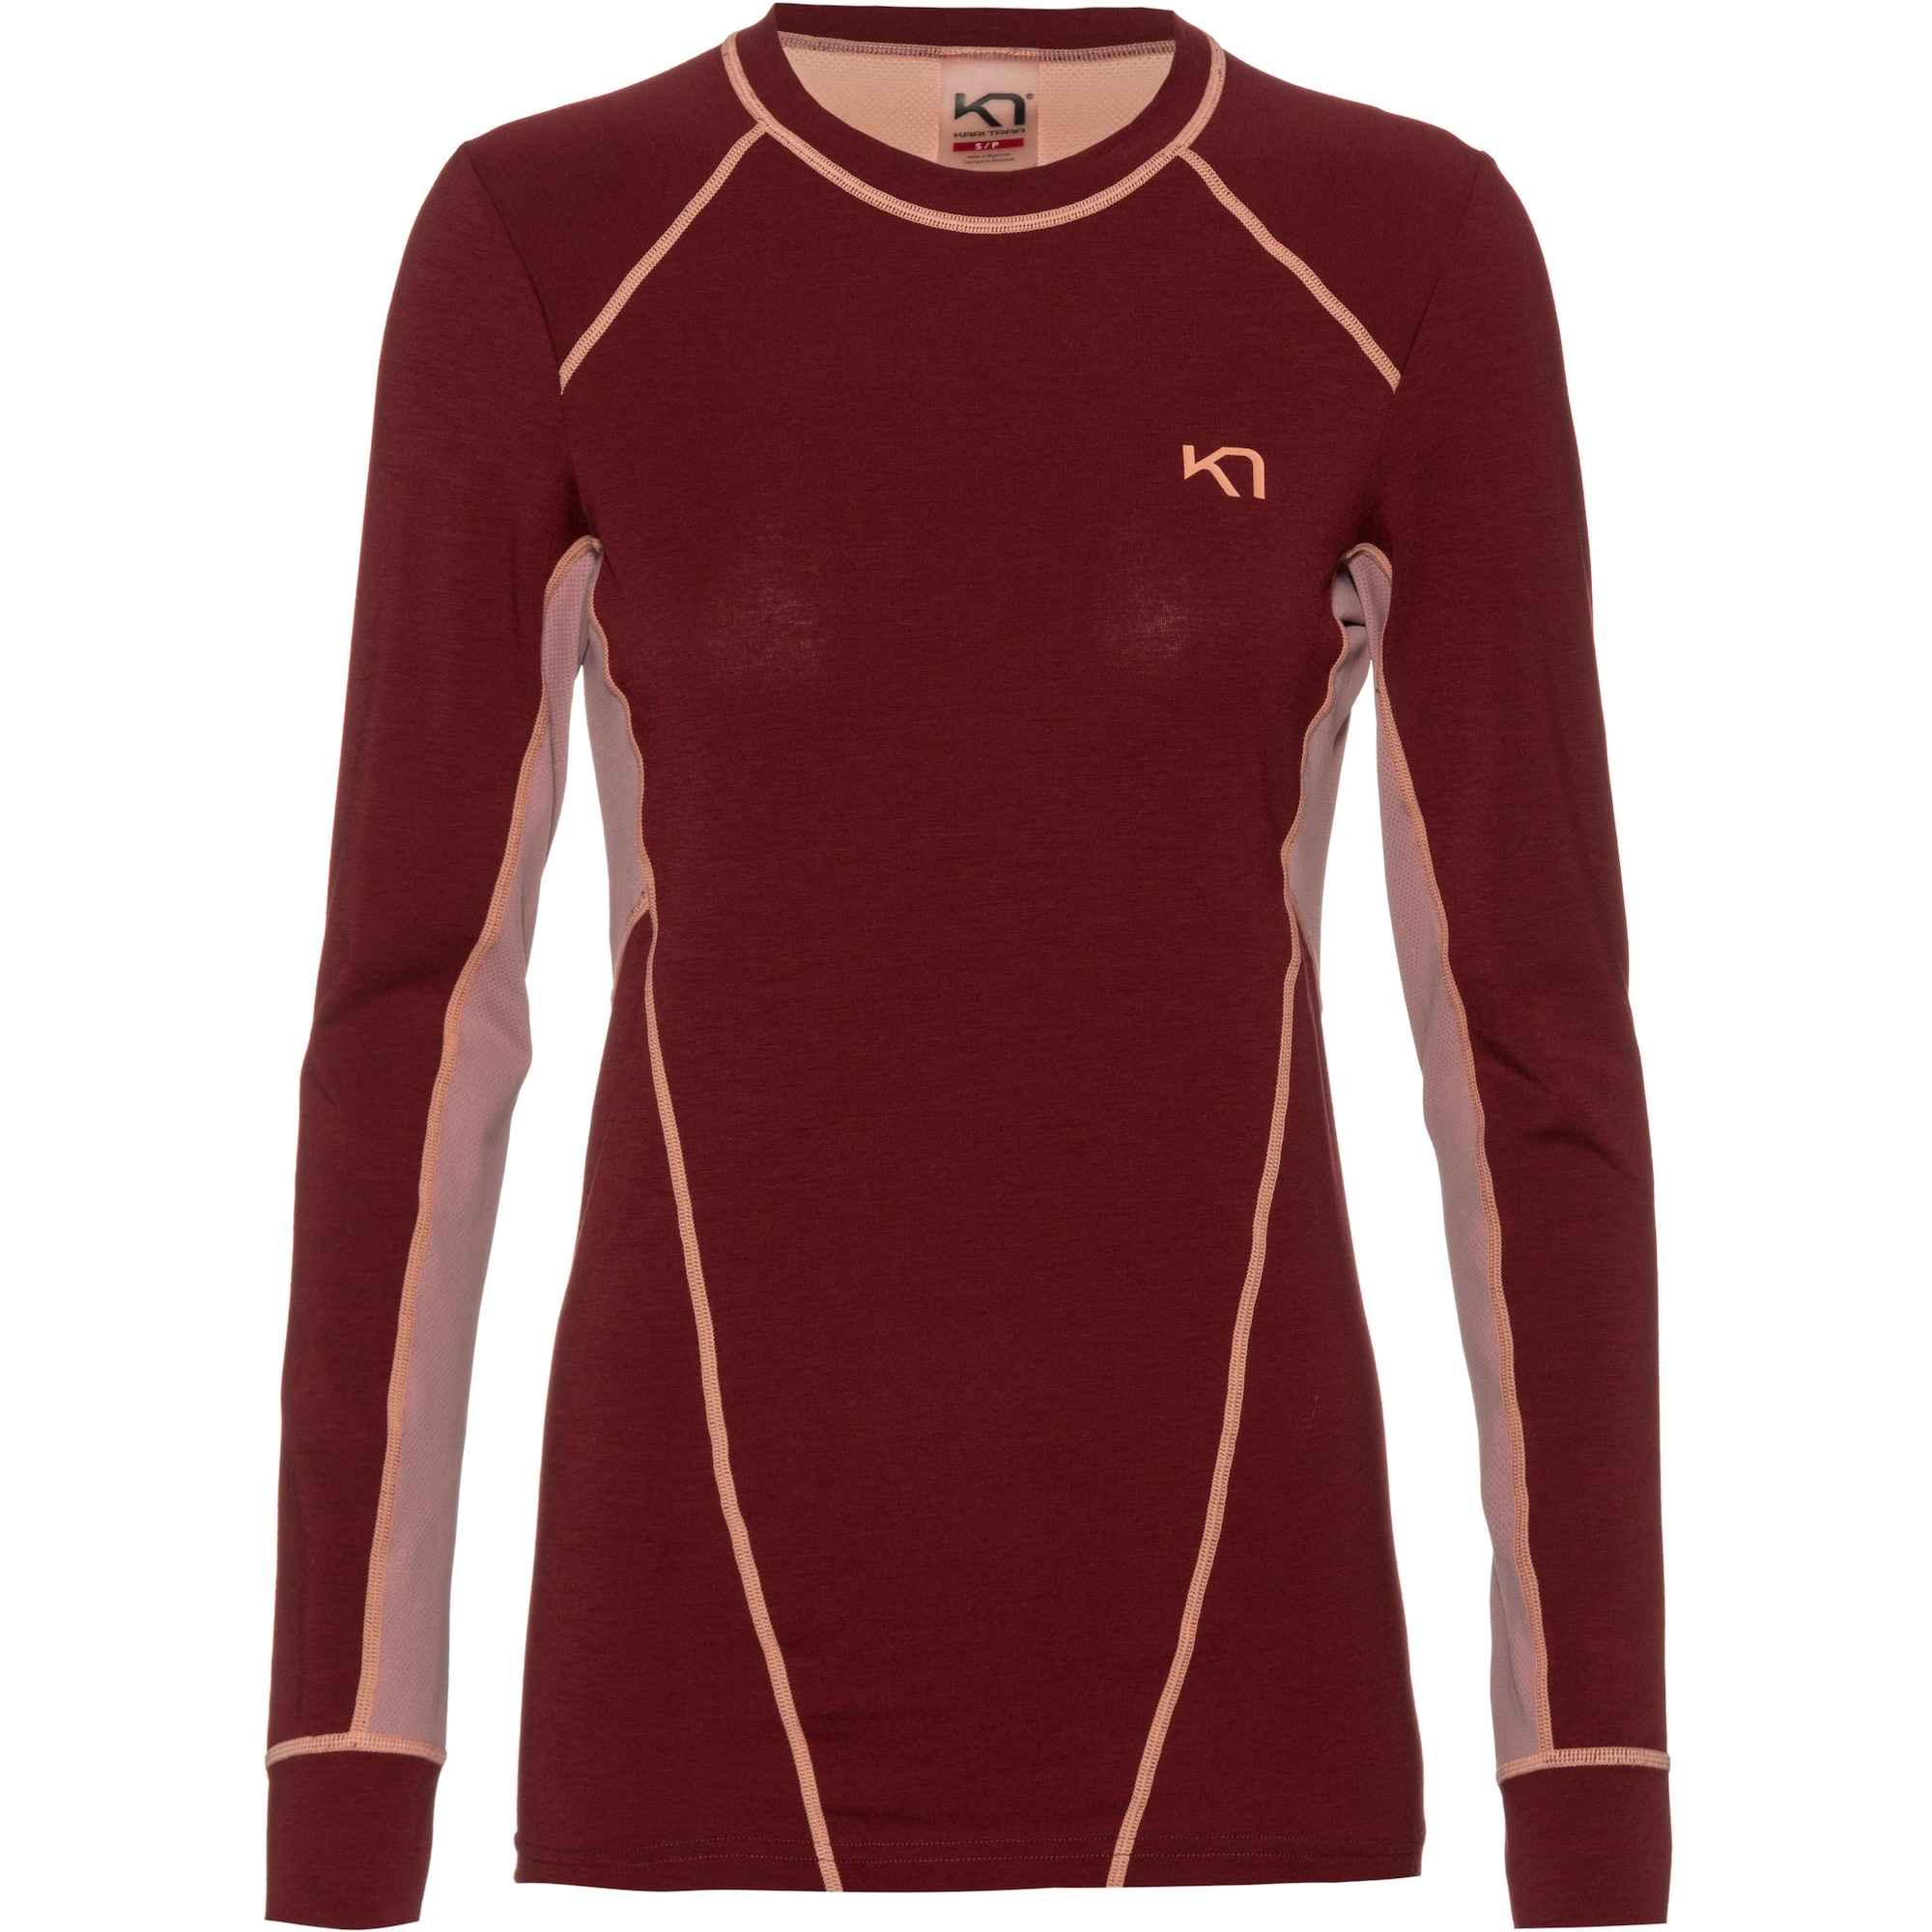 Laufshirt 'Svala' | Sportbekleidung > Sportshirts > Laufshirts | Weinrot | Kari Traa